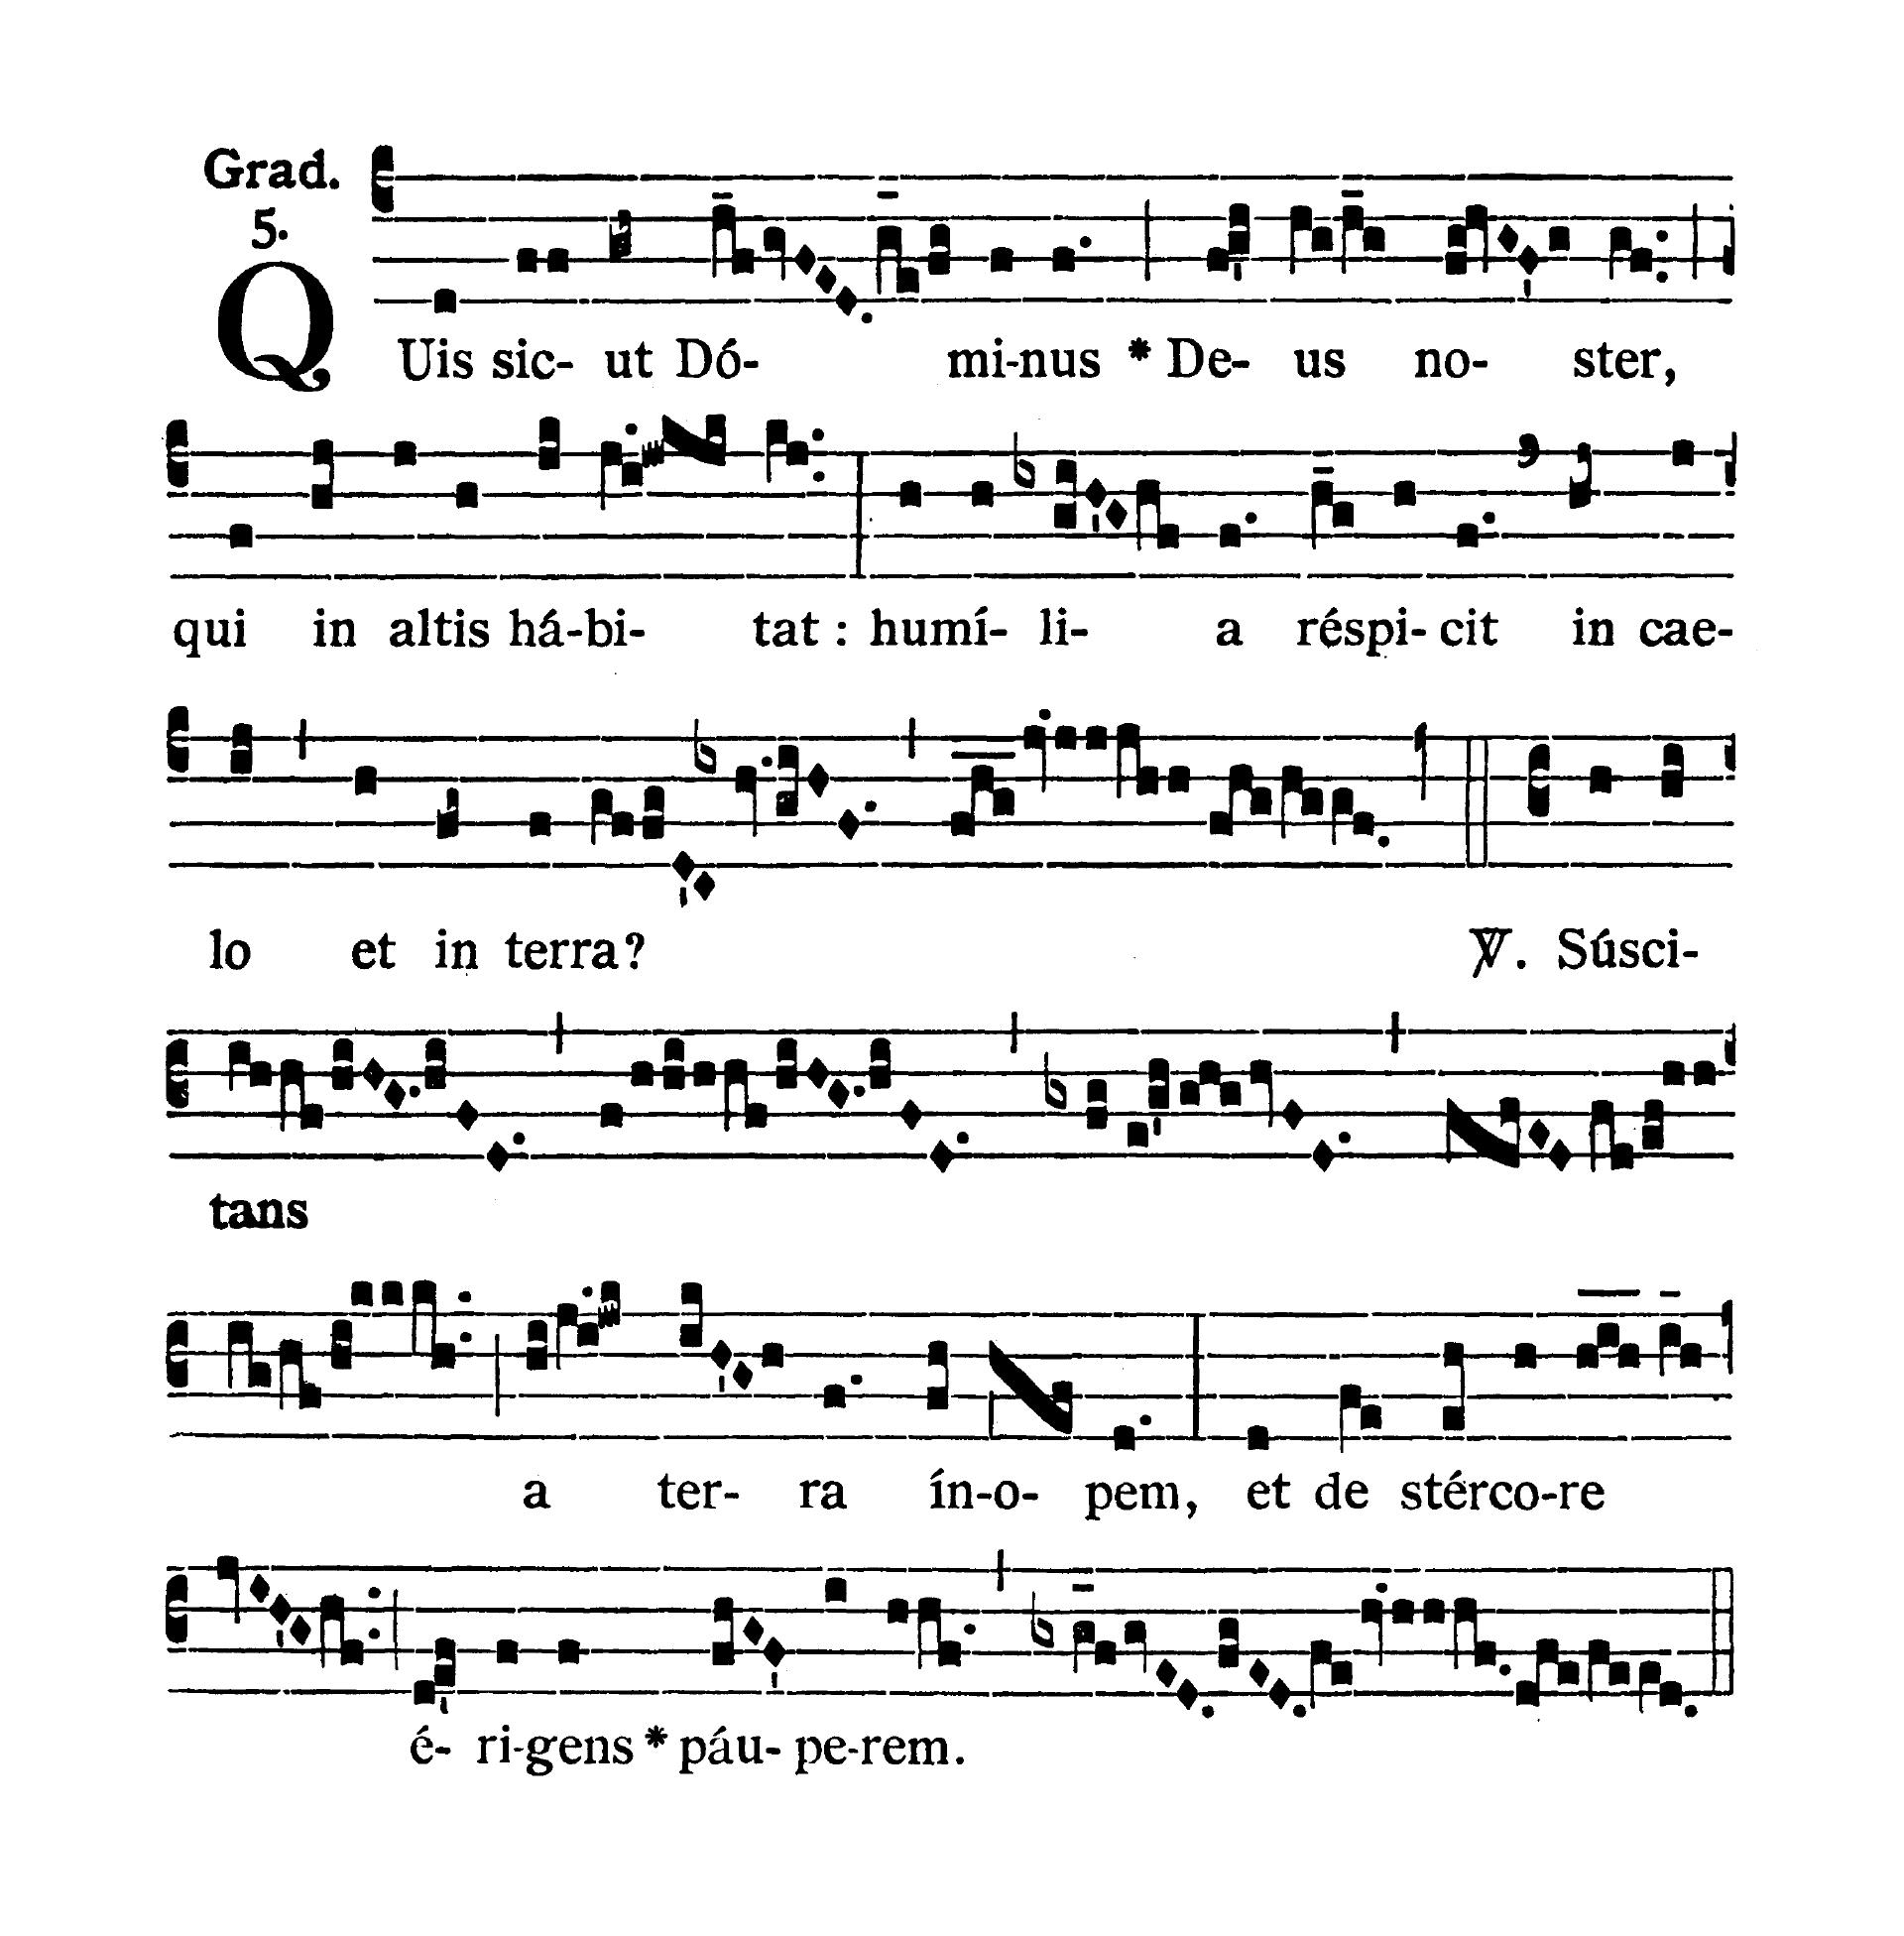 Feria IV Quatuor Temporum Septembris (Środa suchych dni wrześniowych) - Graduale (Quis sicut Dominus)